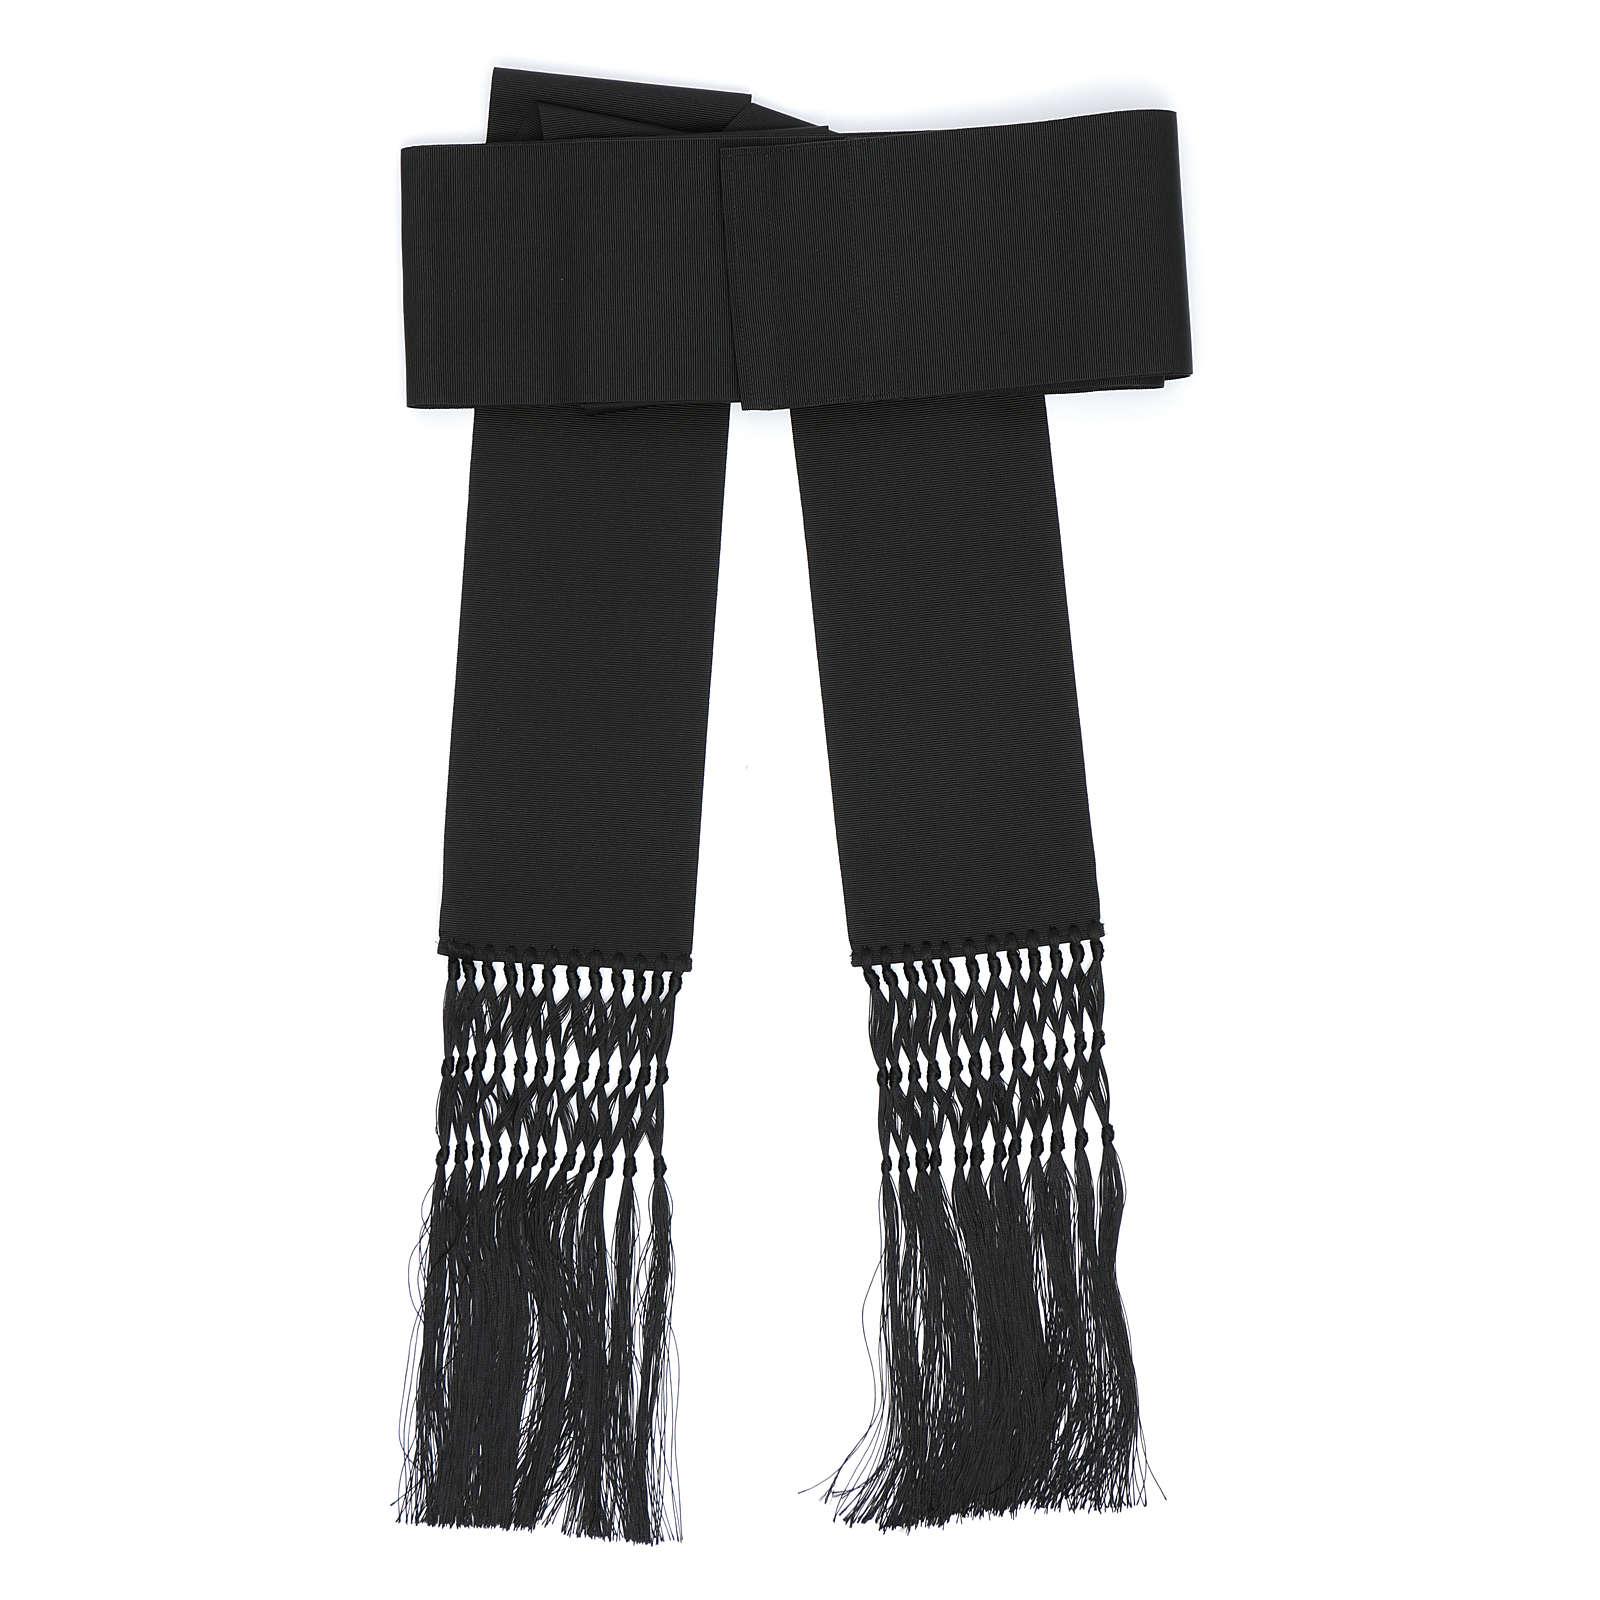 Fajín o banda para sotanas de viscosa color negro 4